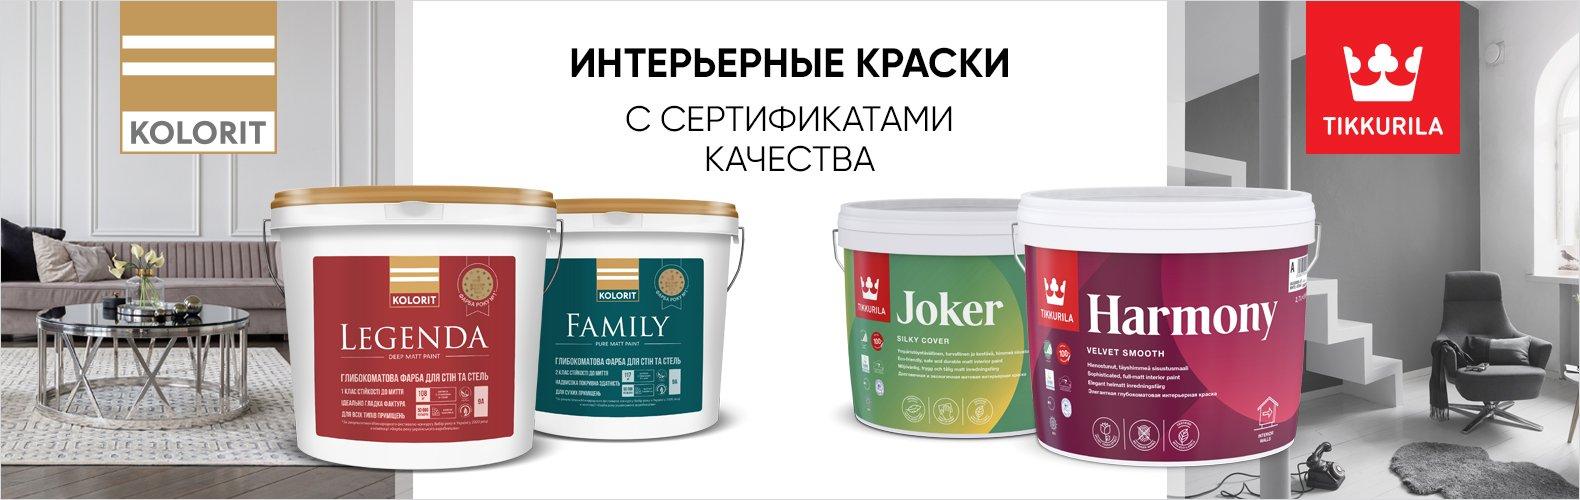 Kolorit-Tikkurila